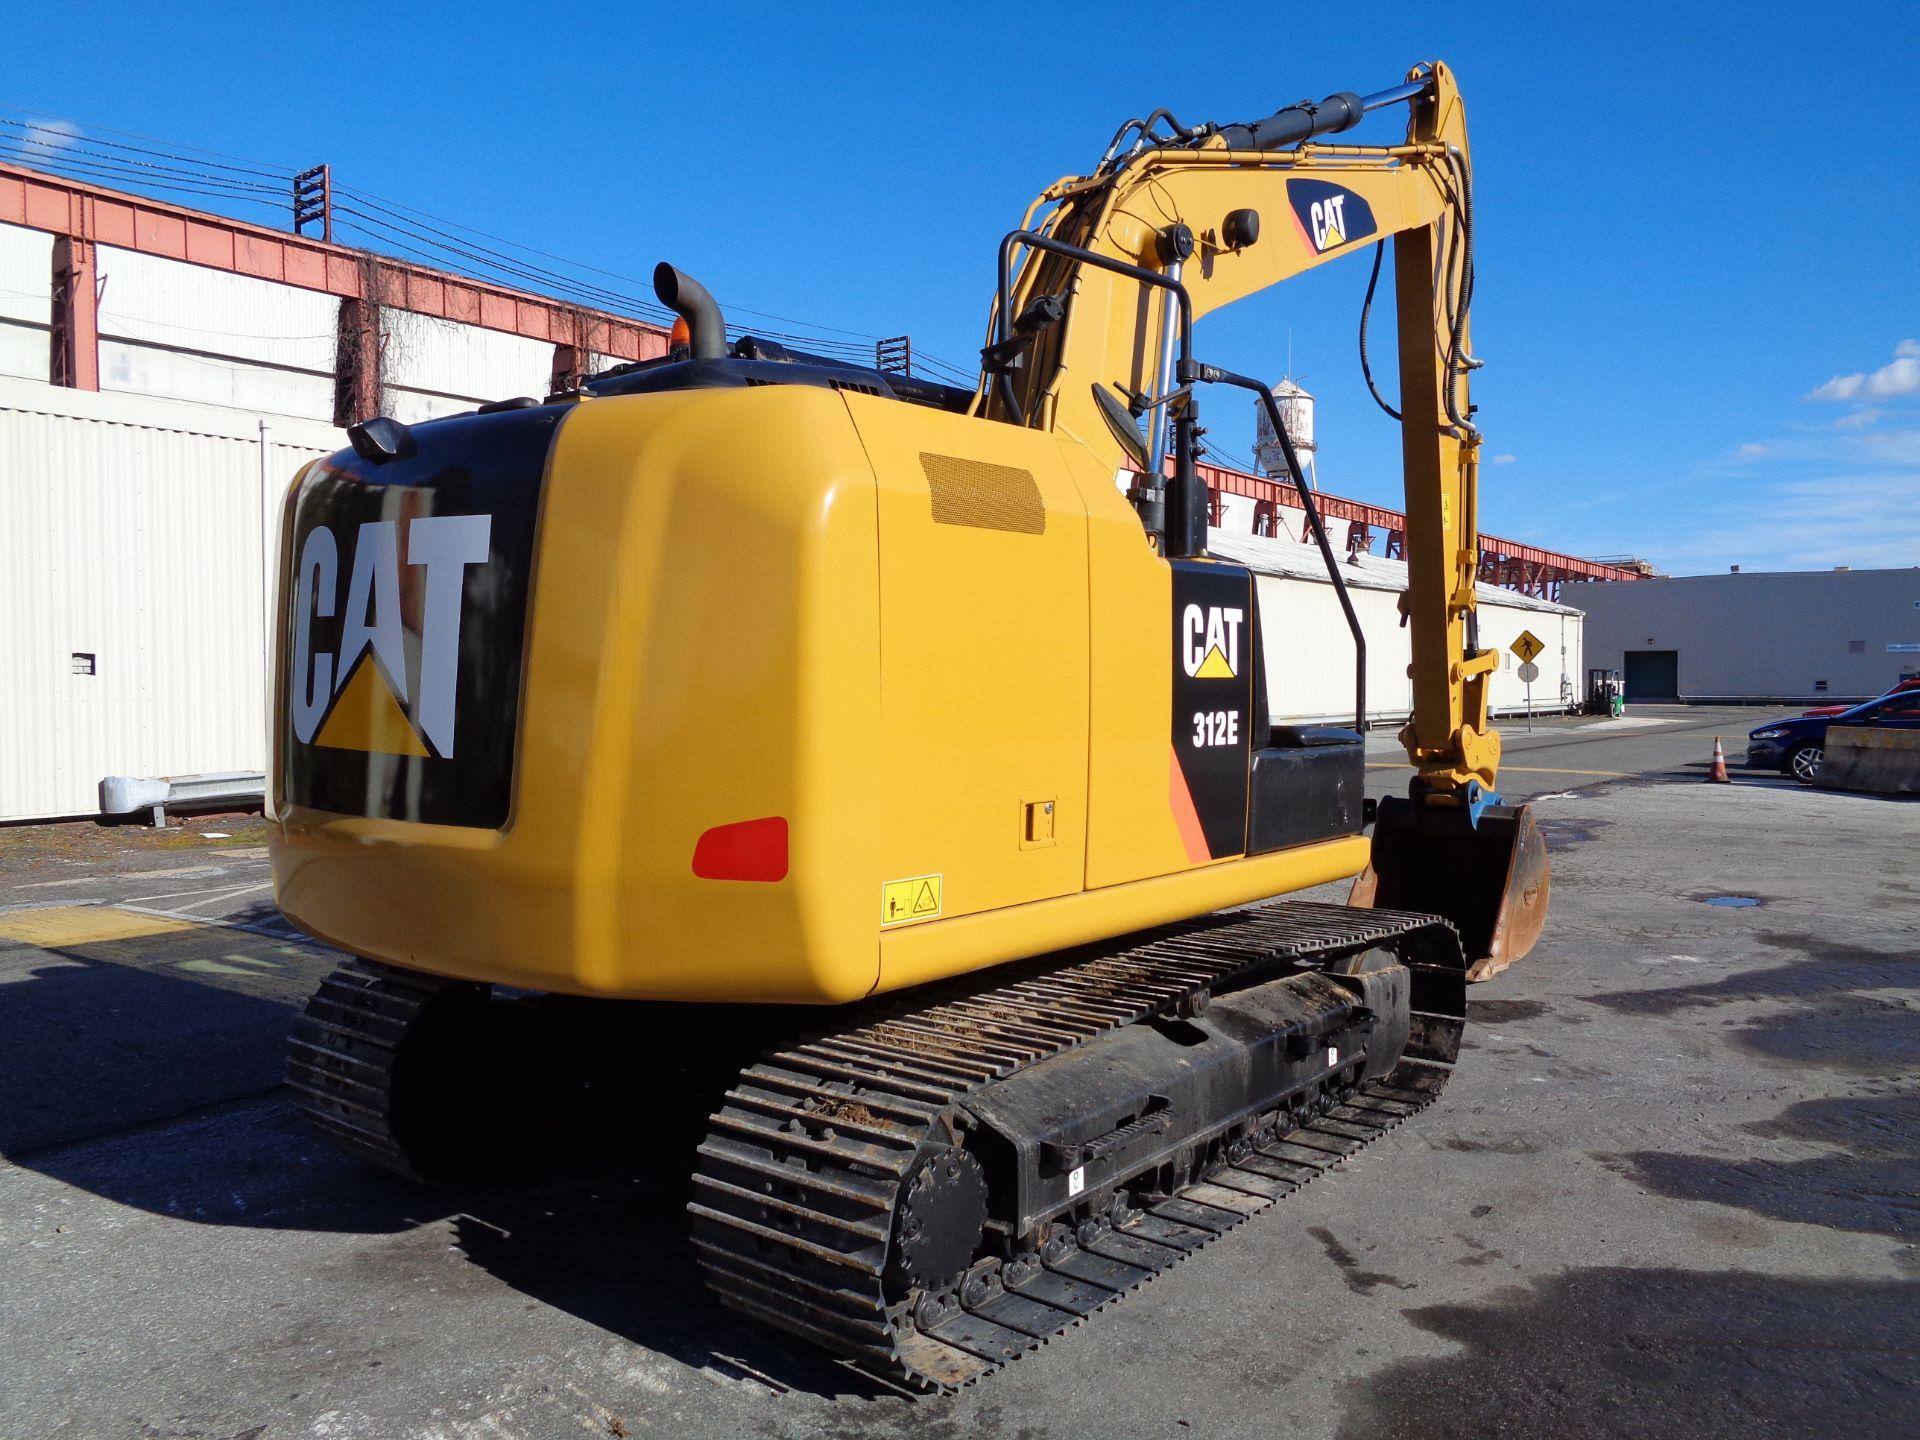 Lot 21 - 2015 Caterpillar 312E Hydraulic Excavator